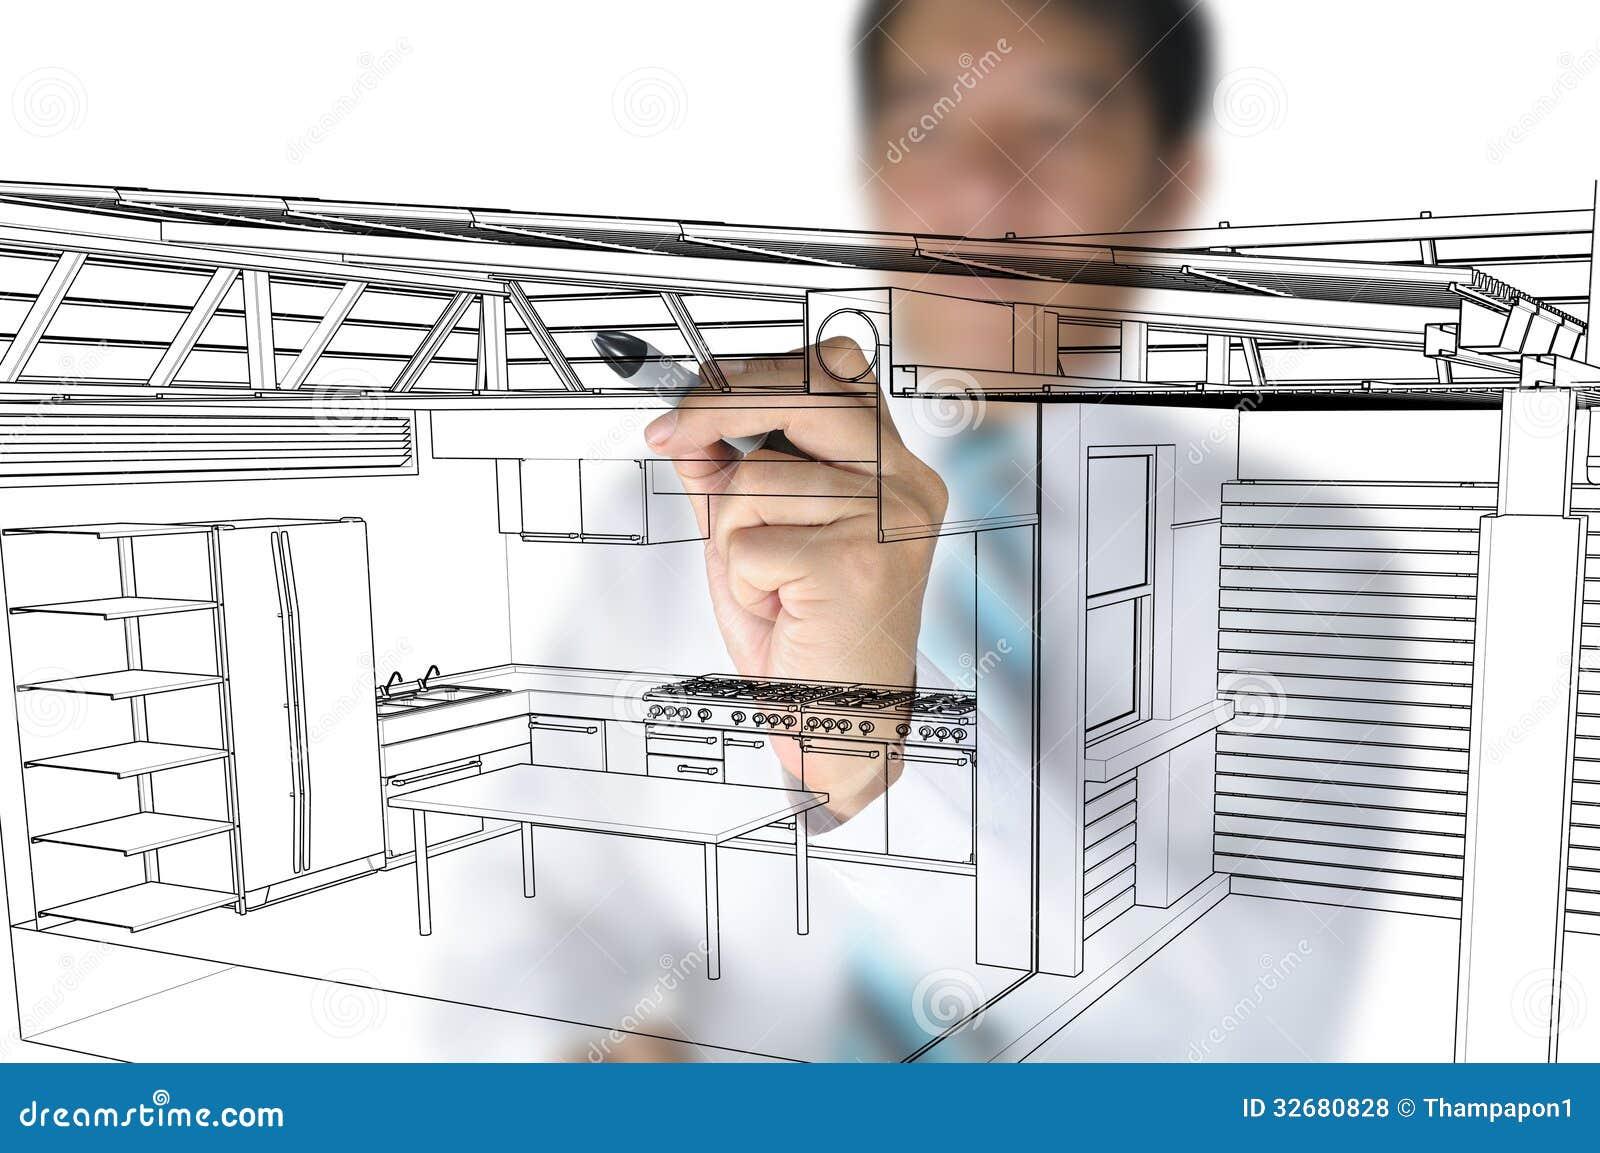 Architect design home kitchen royalty free stock photos image 32680828 - Architect kitchen design ...